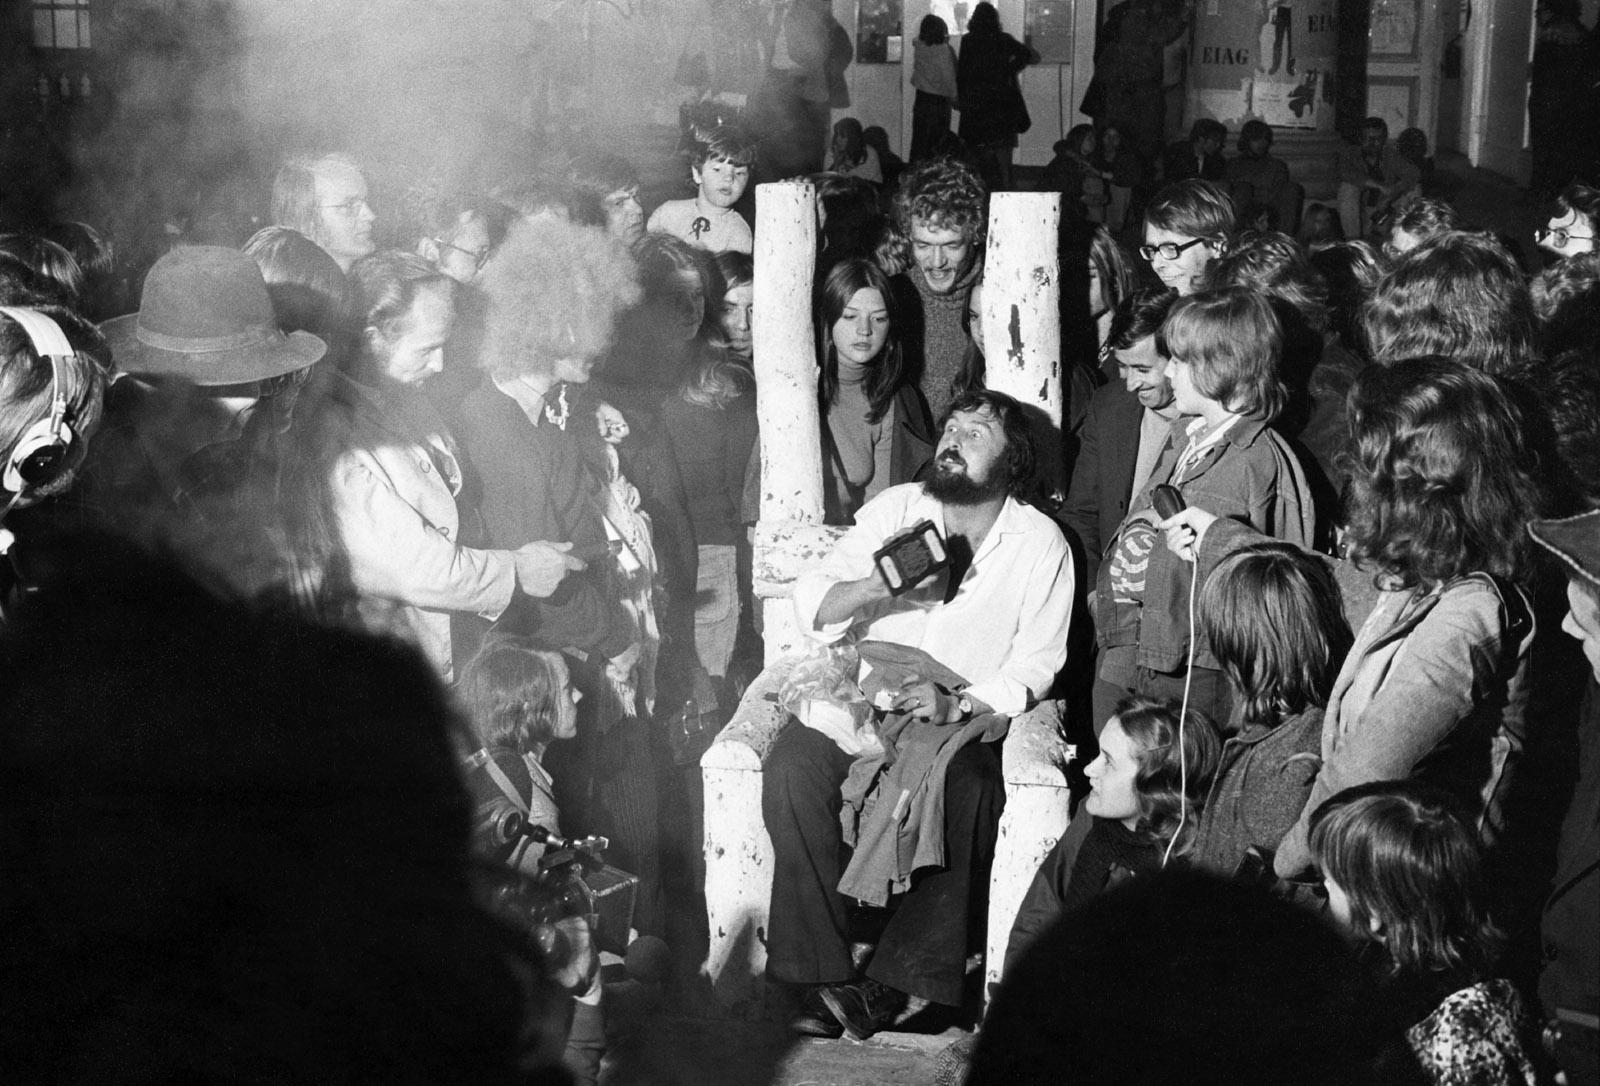 Harald Szeemann in 'Documenta 5: Questioning Reality—Image Worlds Today,' Kassel, Germany, 1972